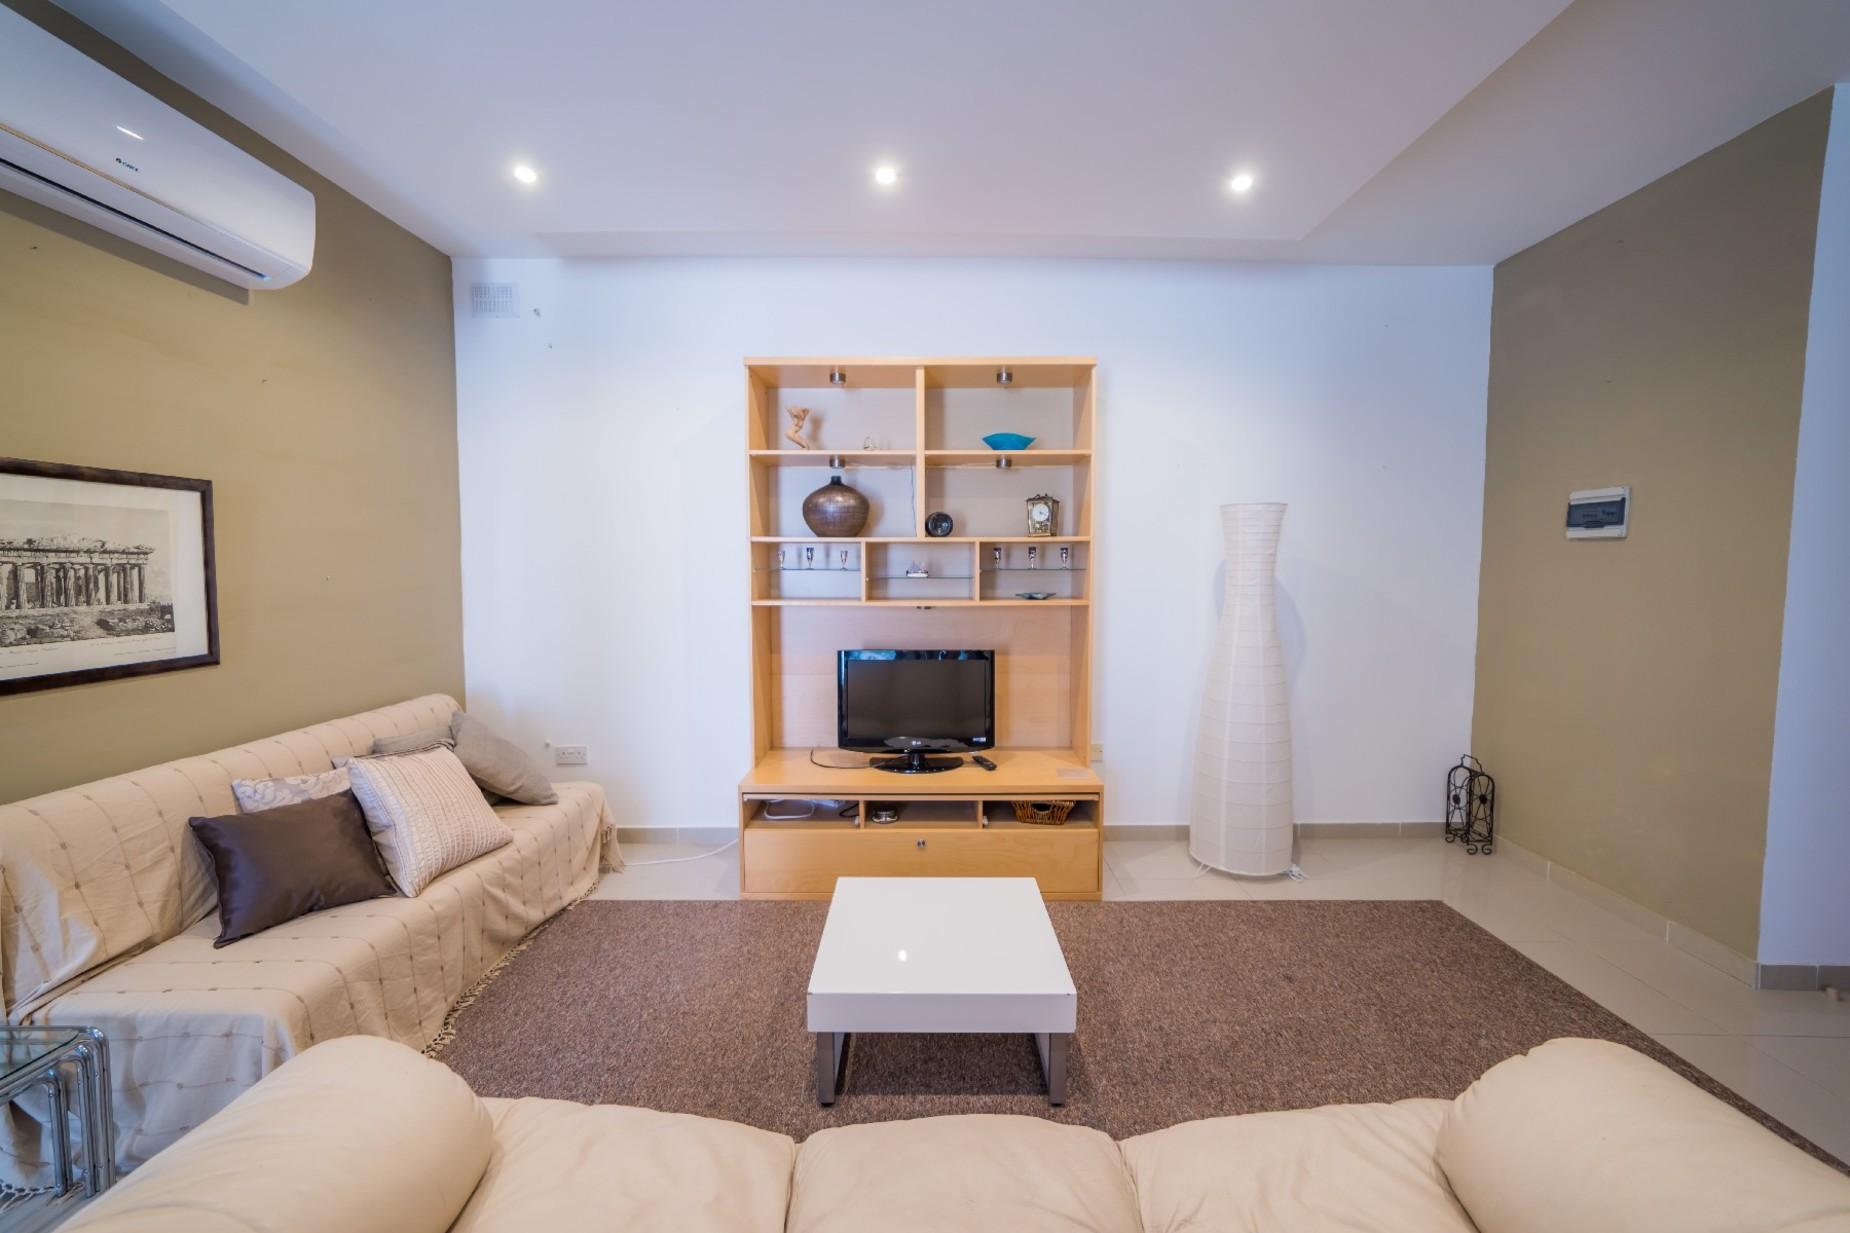 3 bed Penthouse For Rent in Lija, Lija - thumb 6